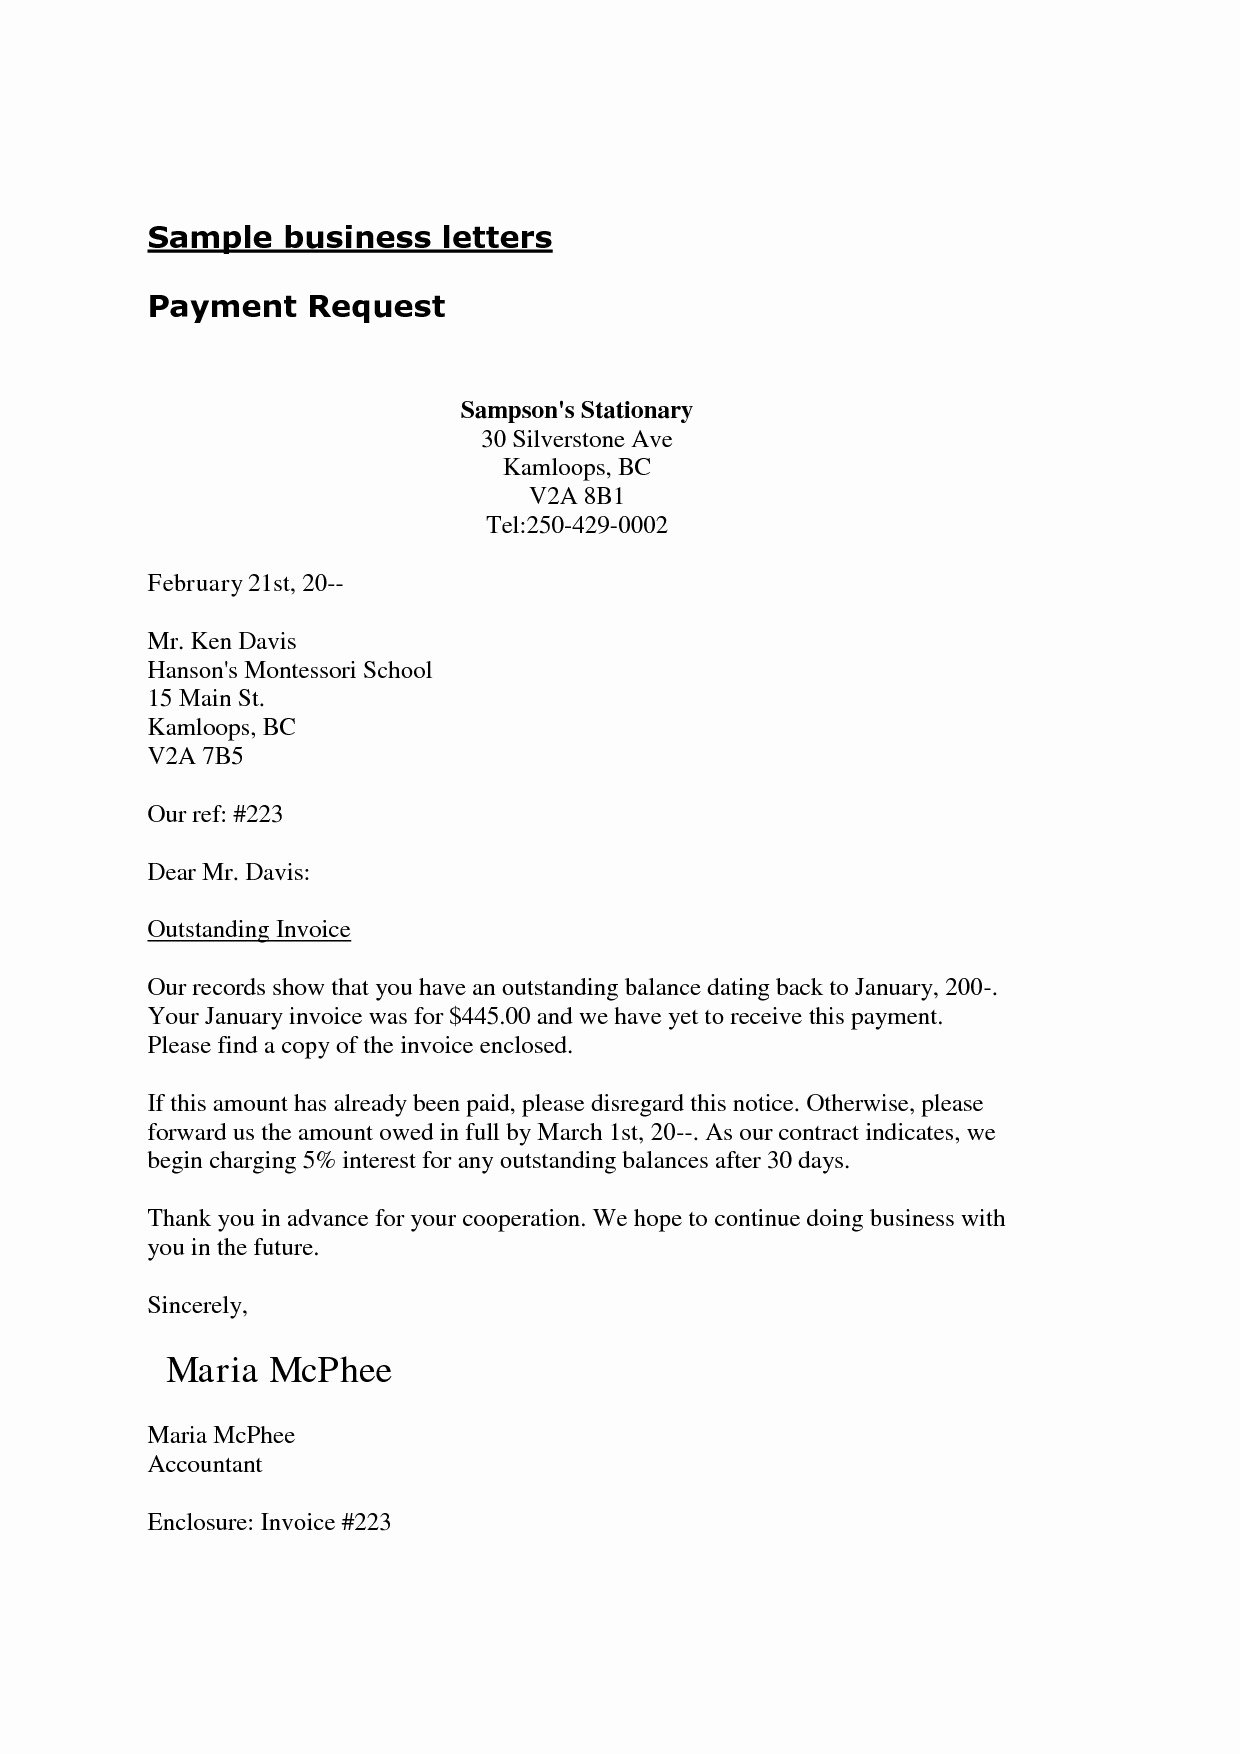 Business Letter Enclosure format Lovely Letter with Enclosures Sample